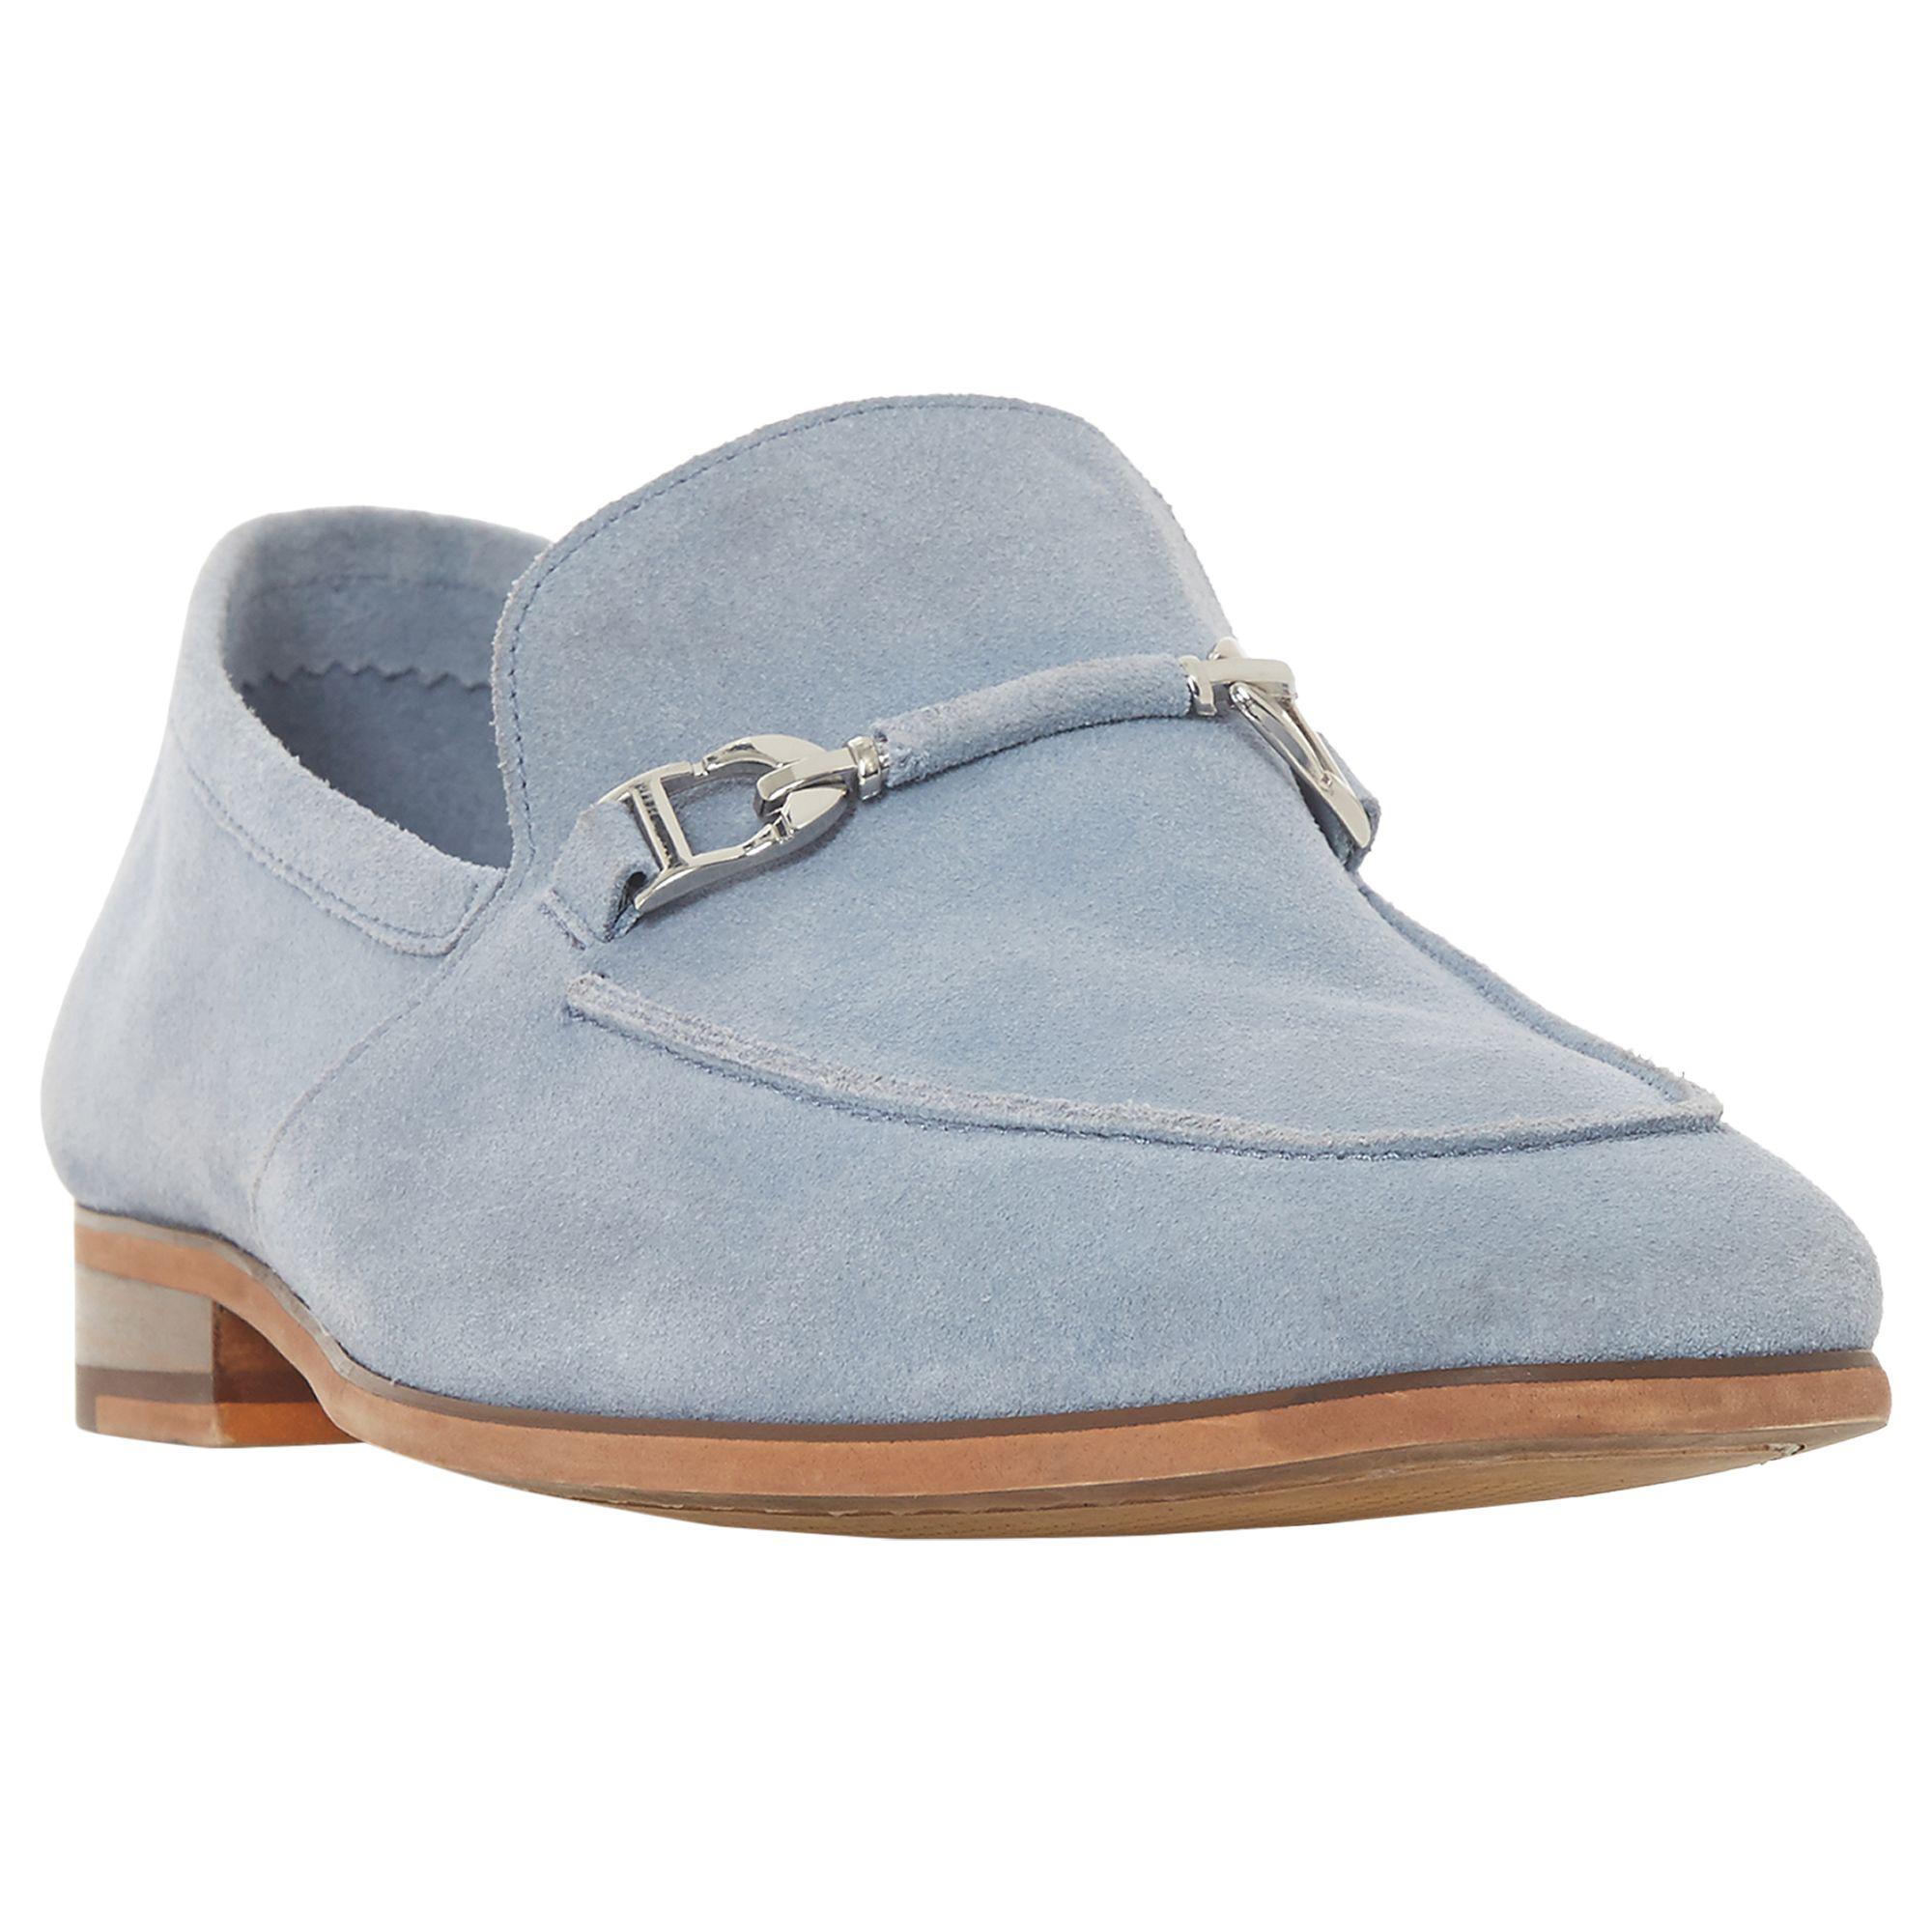 Dune Paulinho Suede Loafers in Light Blue (Blue) for Men